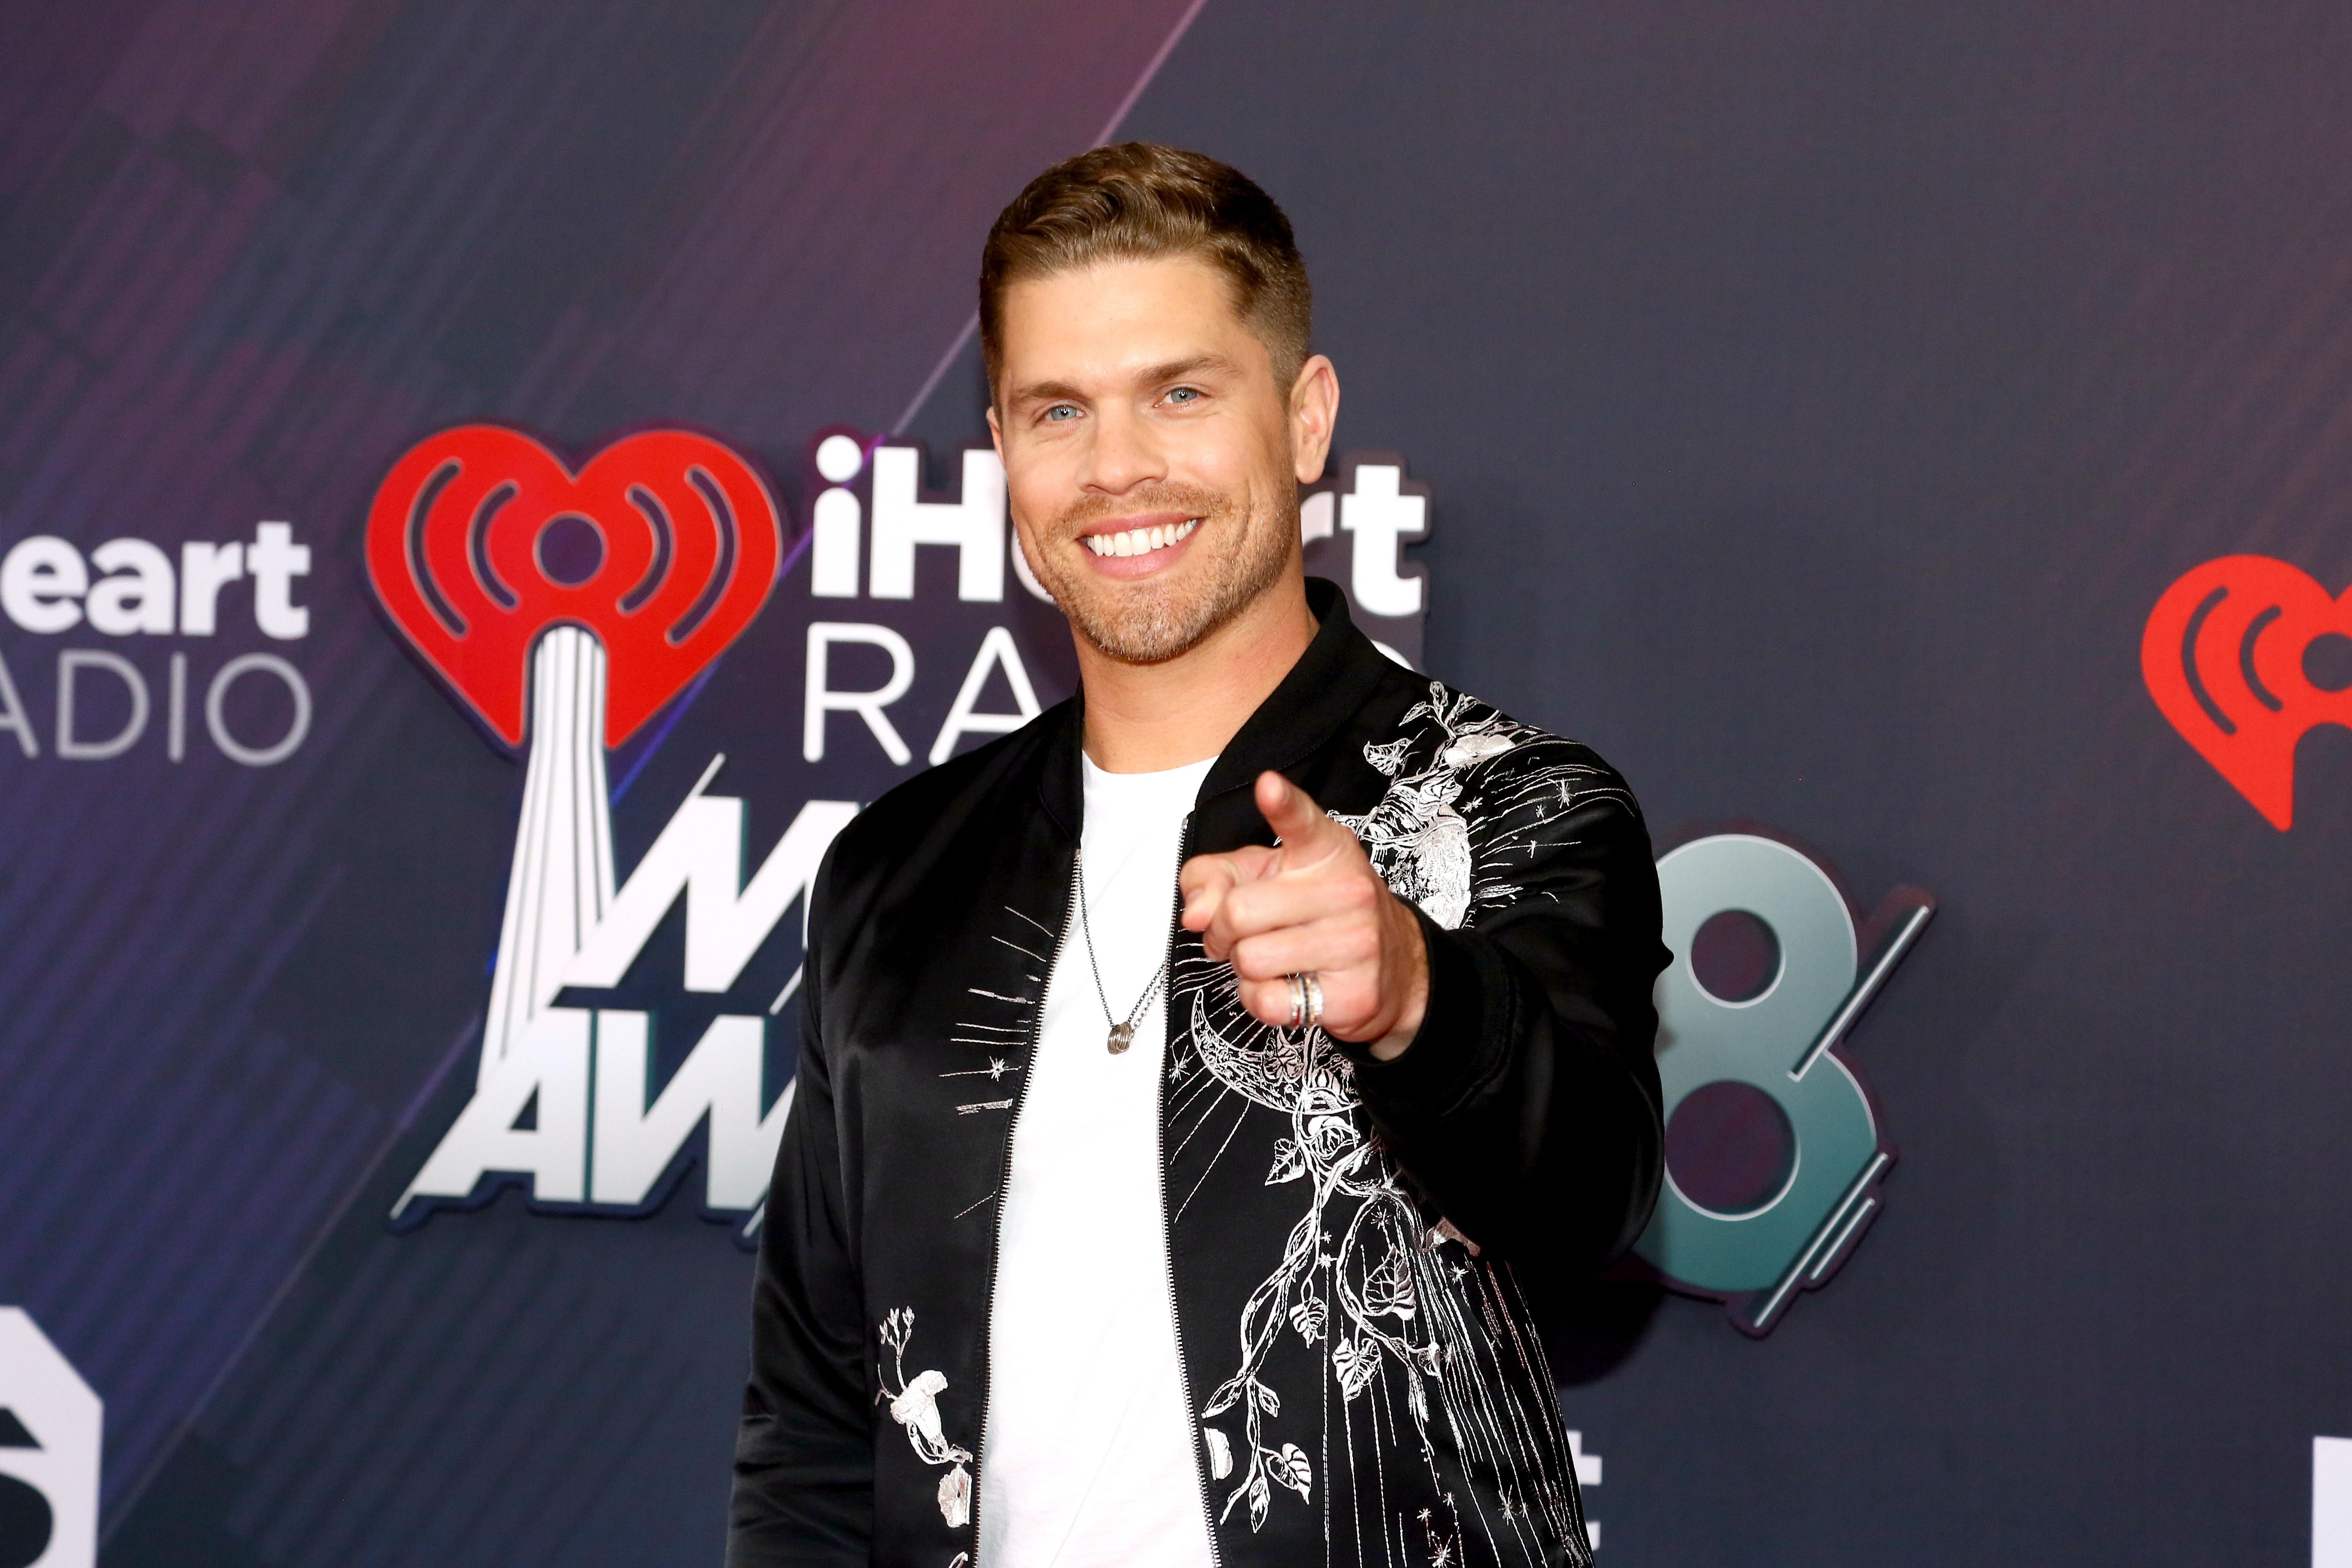 Thomas Rhett, Sam Hunt Go Home as Winners at the 2018 iHeartRadio Awards